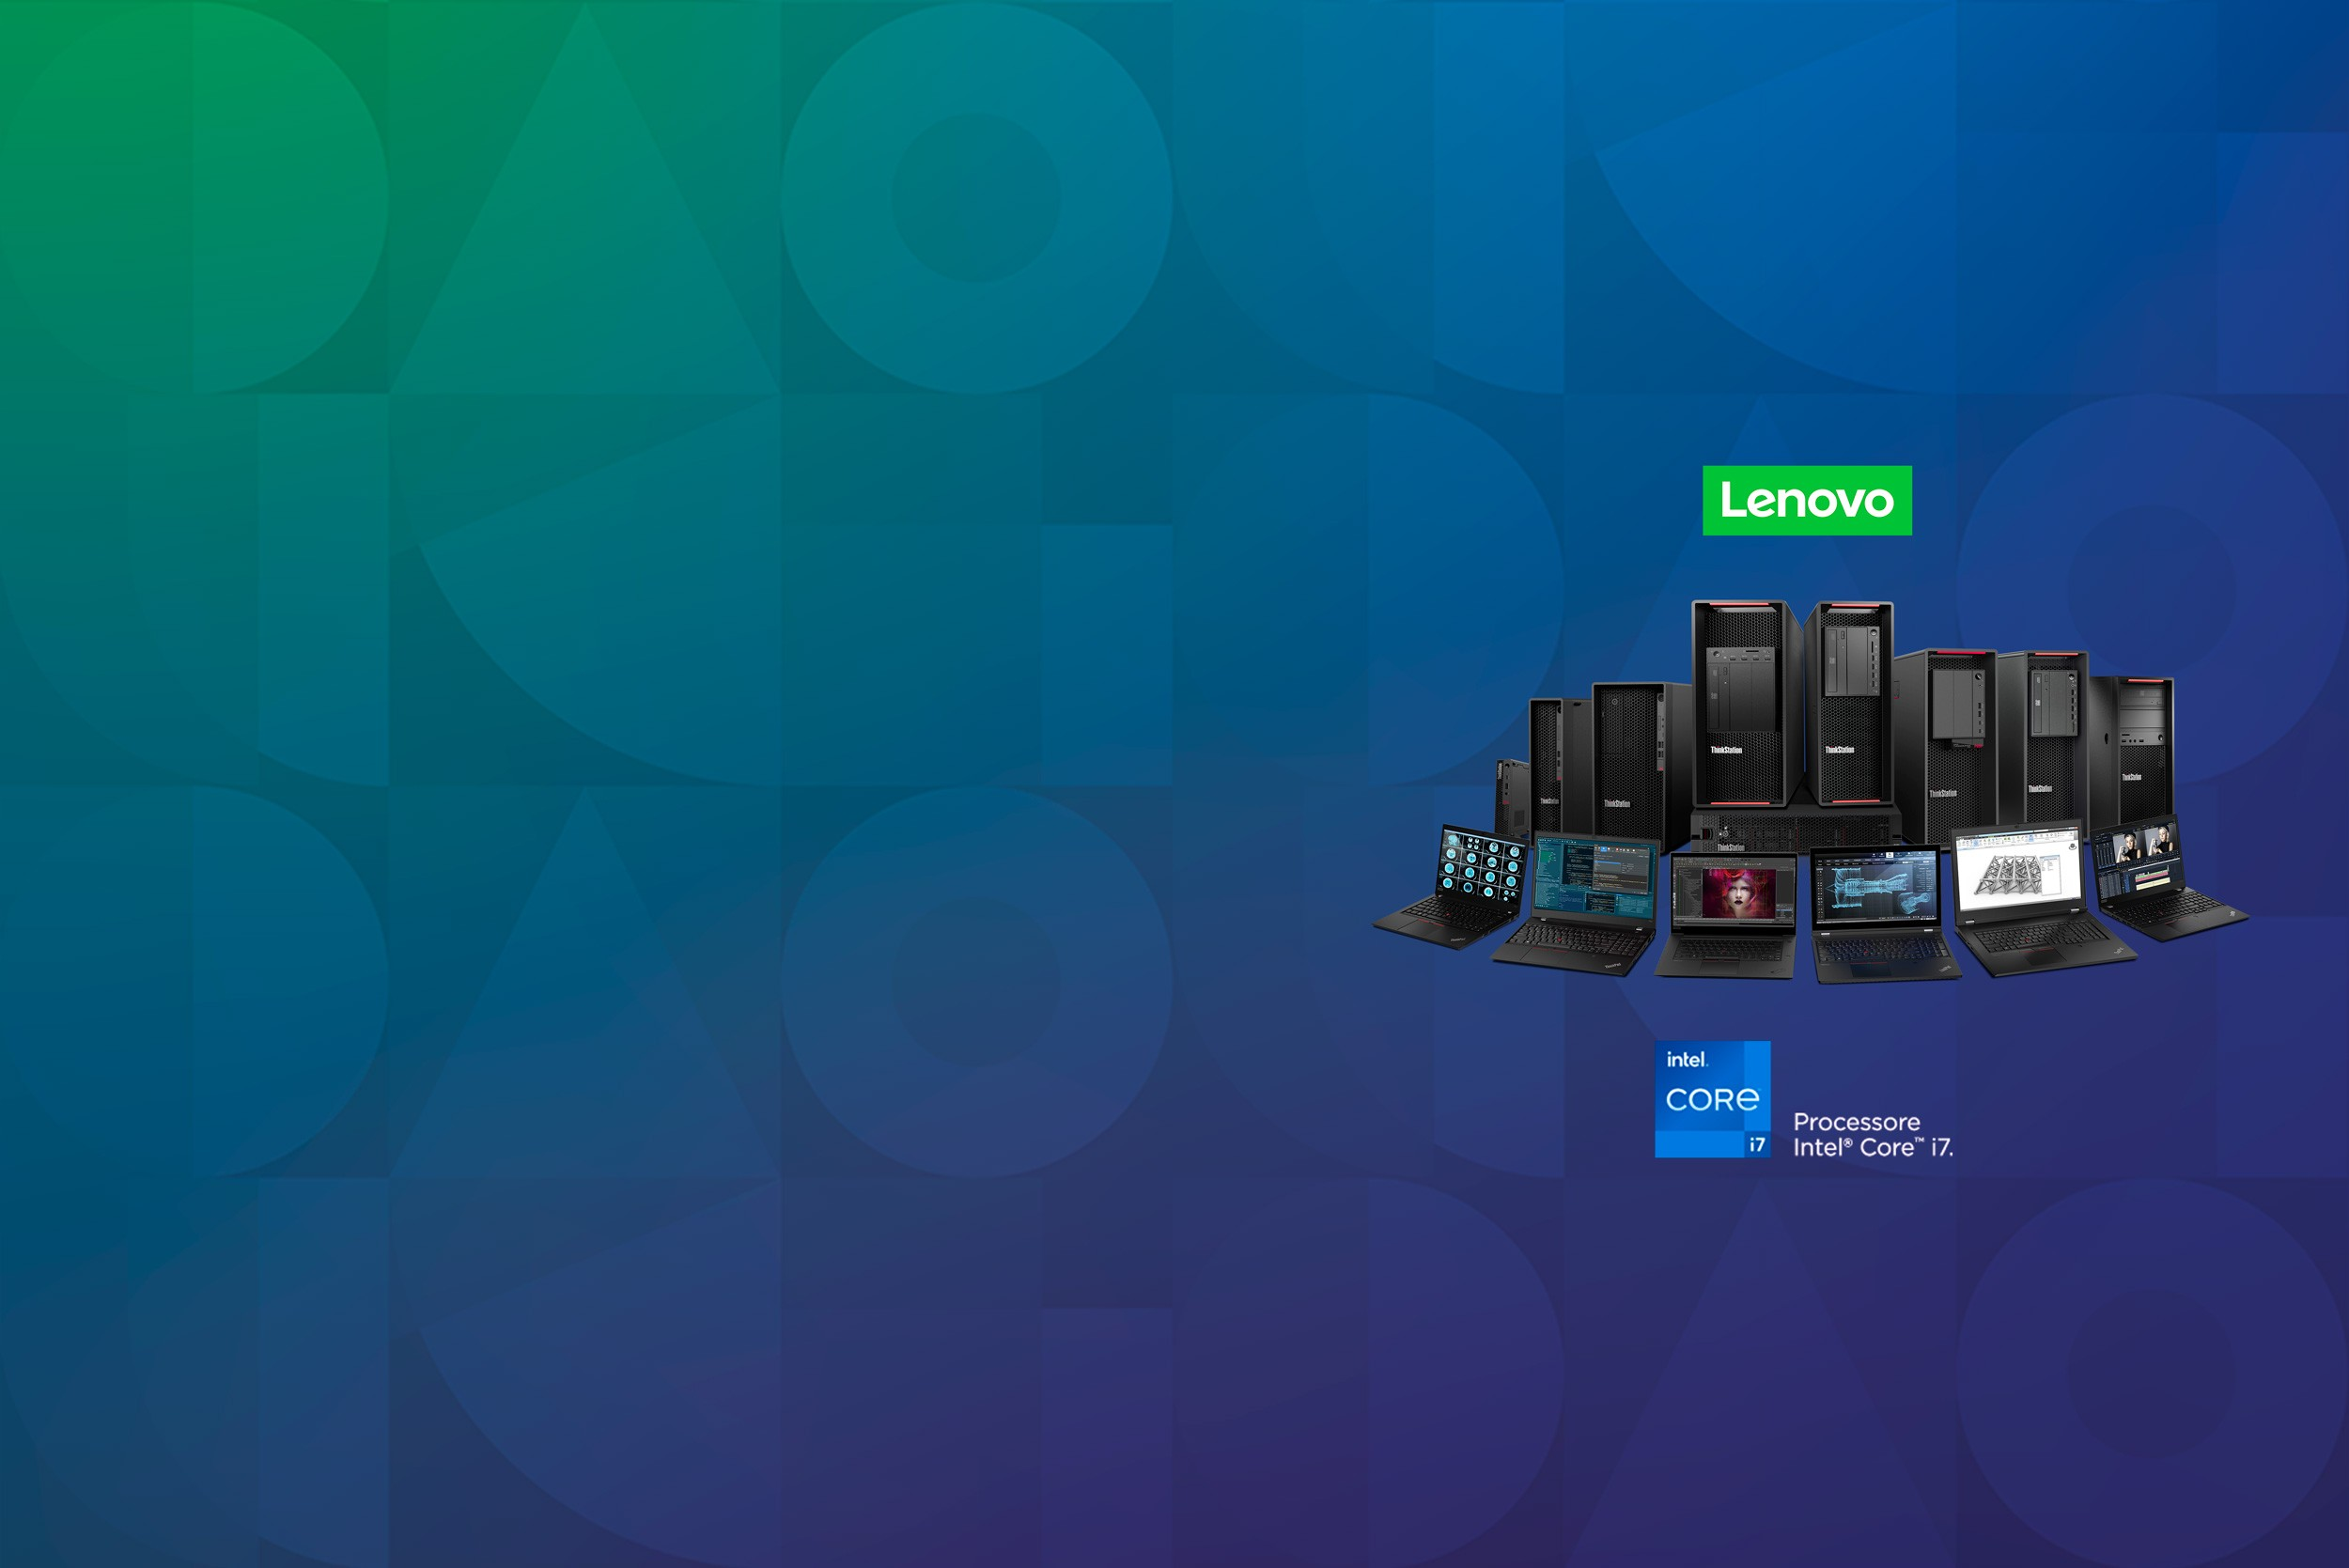 "<span class=""orange""> Lenovo: </span> potenza, performance, <br> produttività"